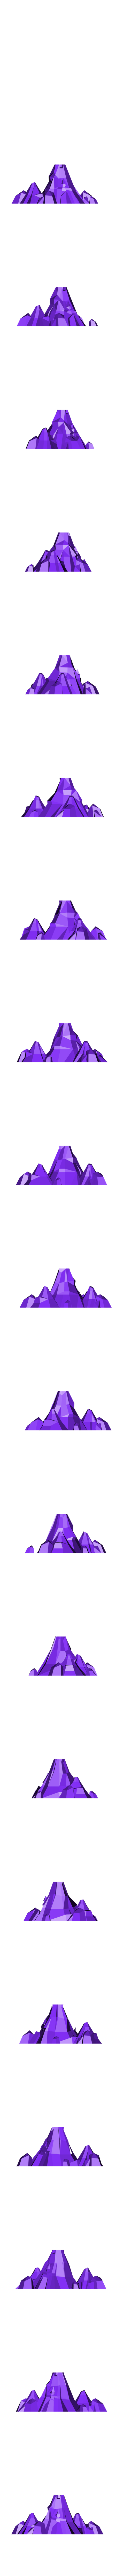 PUSHILIN_volcano.obj Download free OBJ file Volcano • 3D printing model, Colorful3D